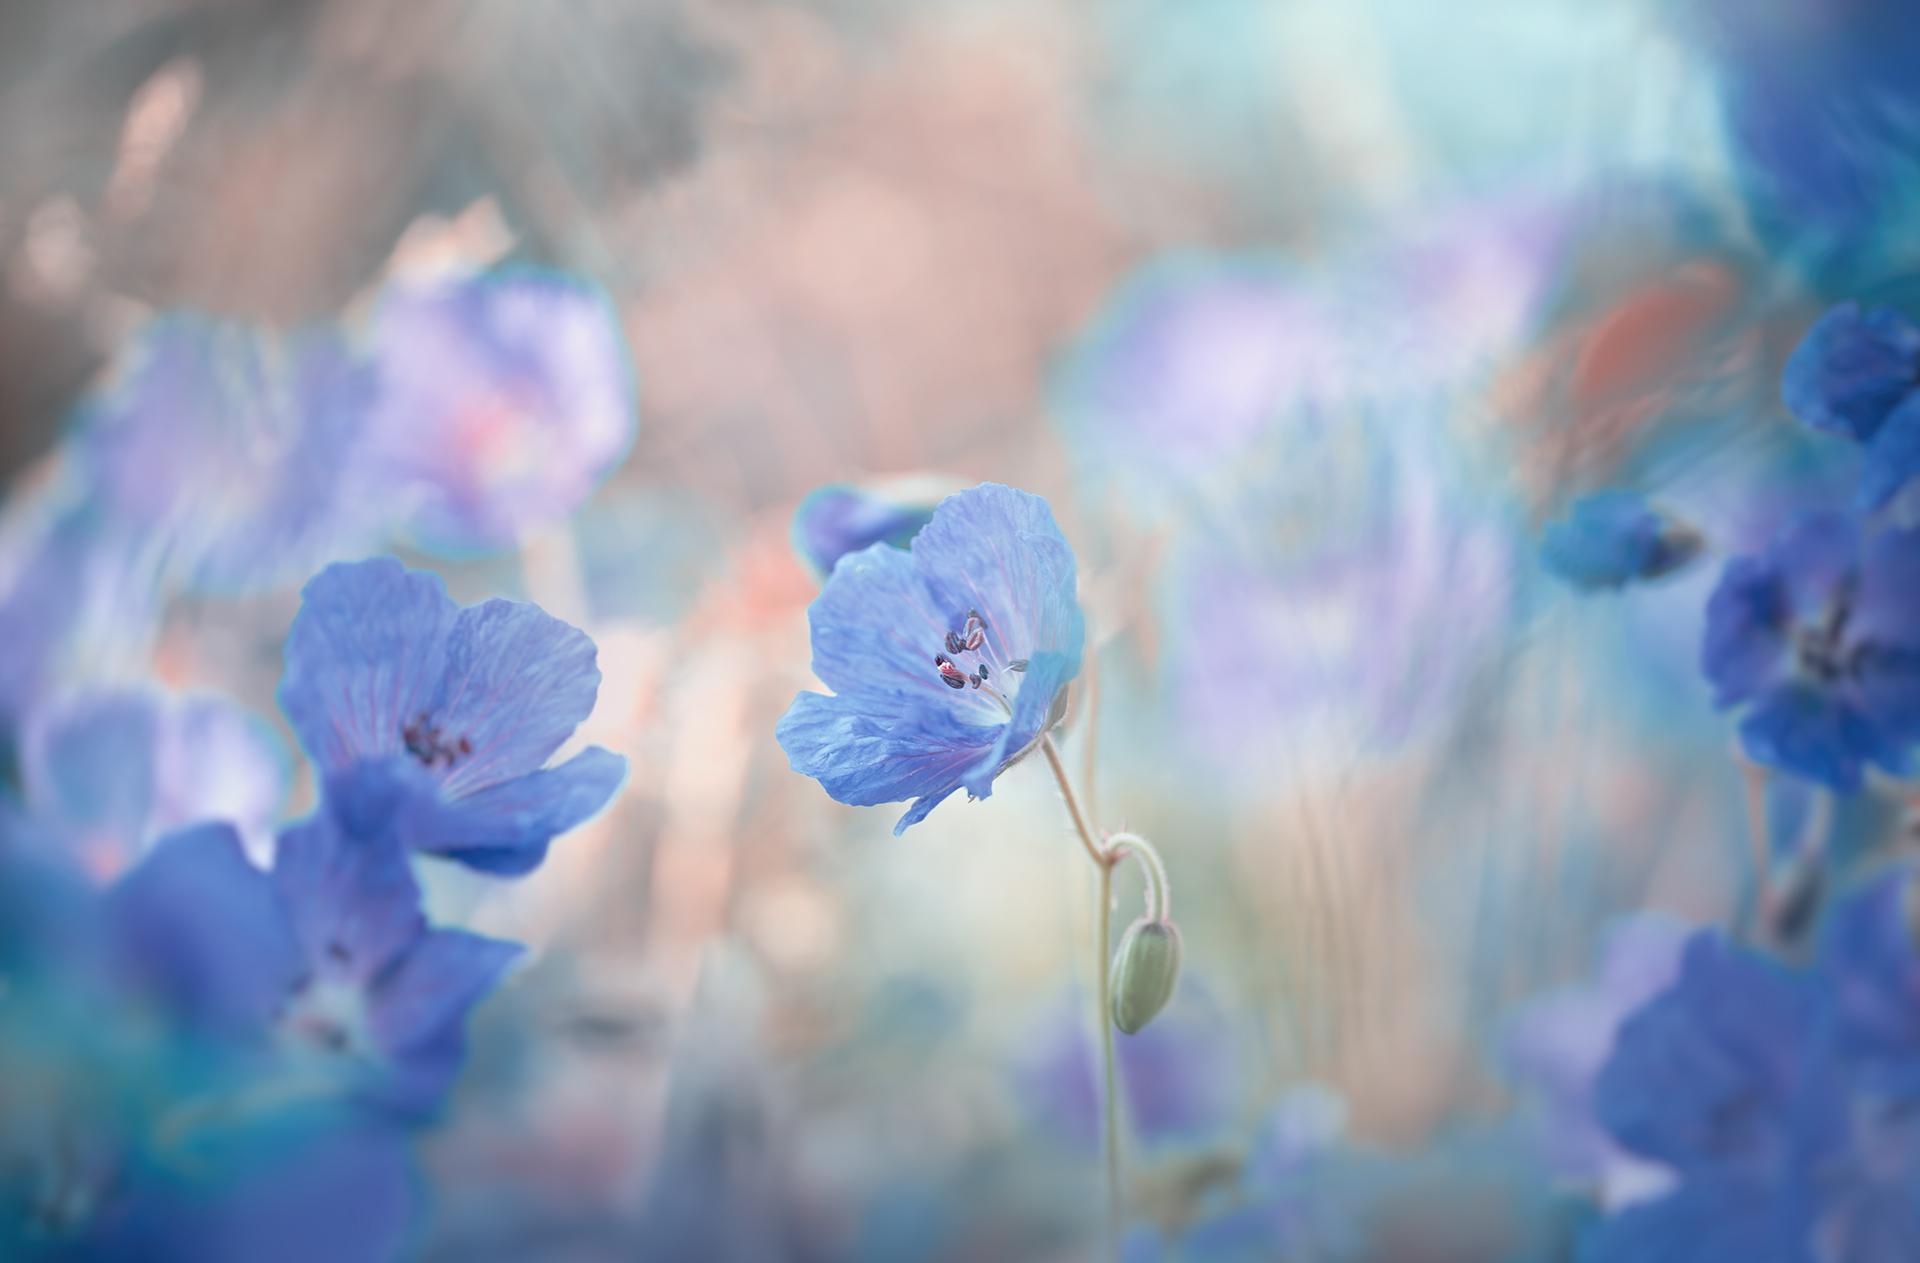 in Blue | Author Nikki Georgieva  V E G A N I K - vega_nik | PHOTO FORUM